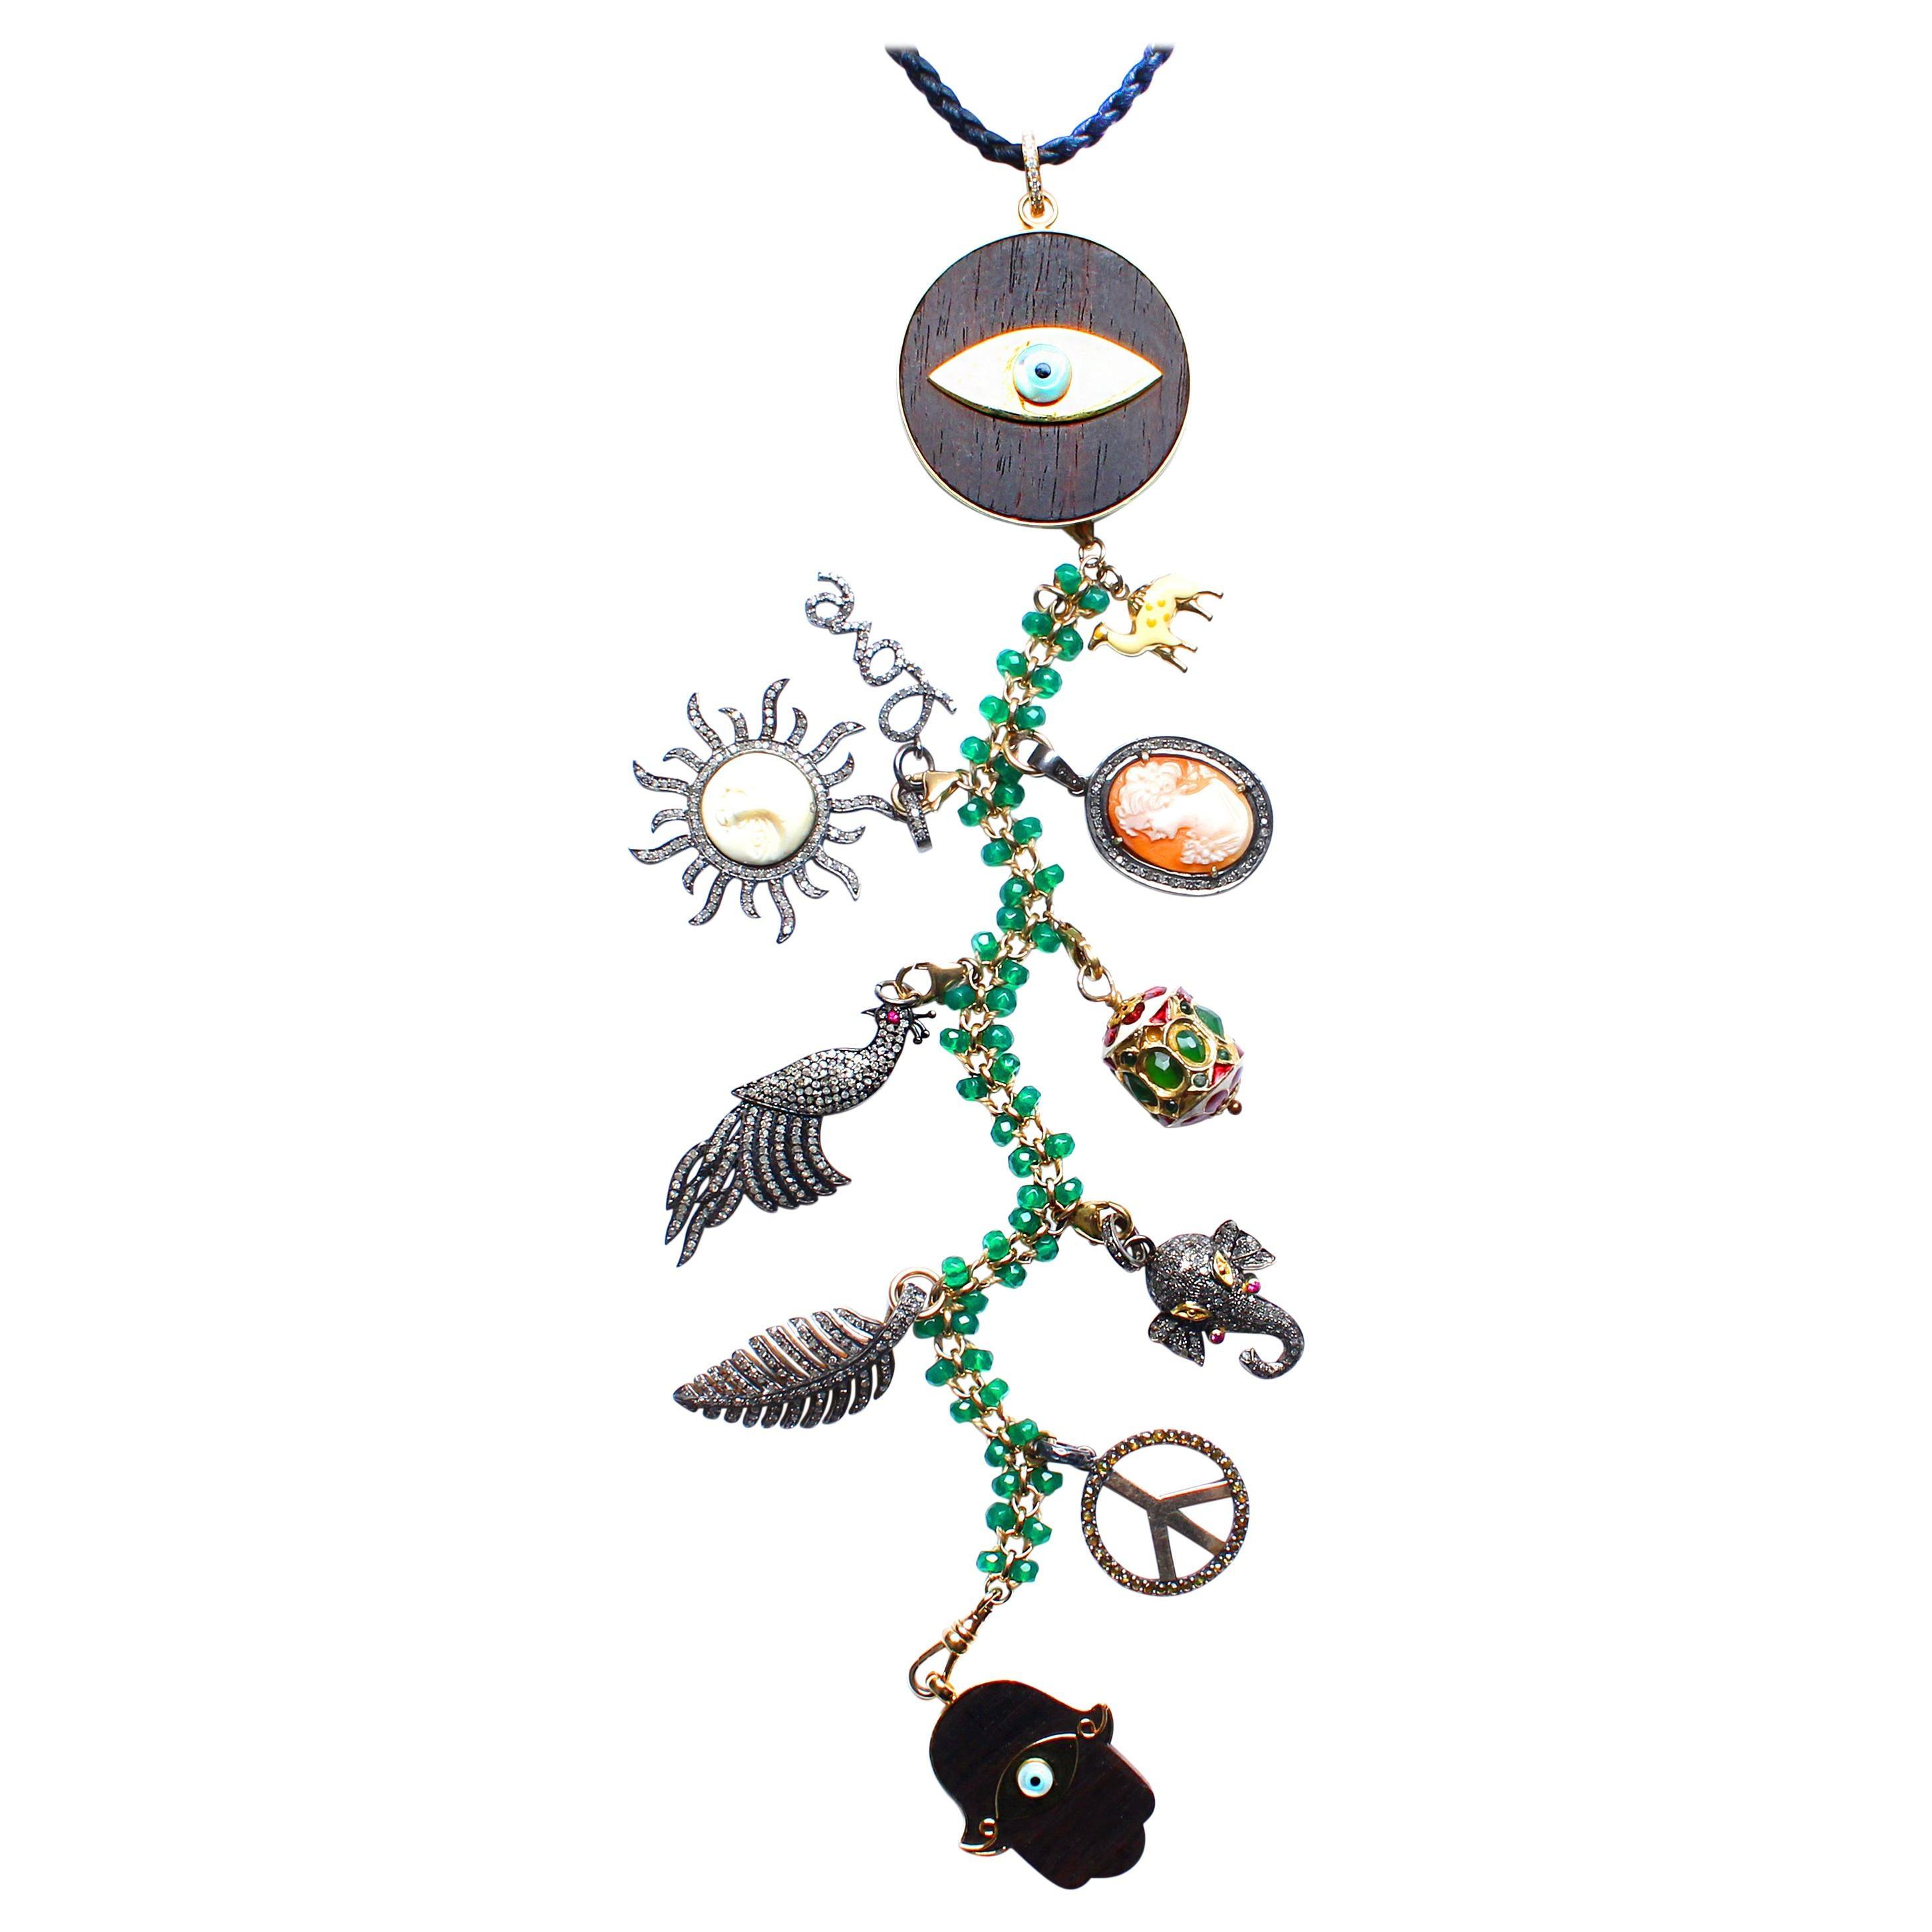 Clarissa Bronfman Signature 'RAINFOREST' Symbol Tree Necklace